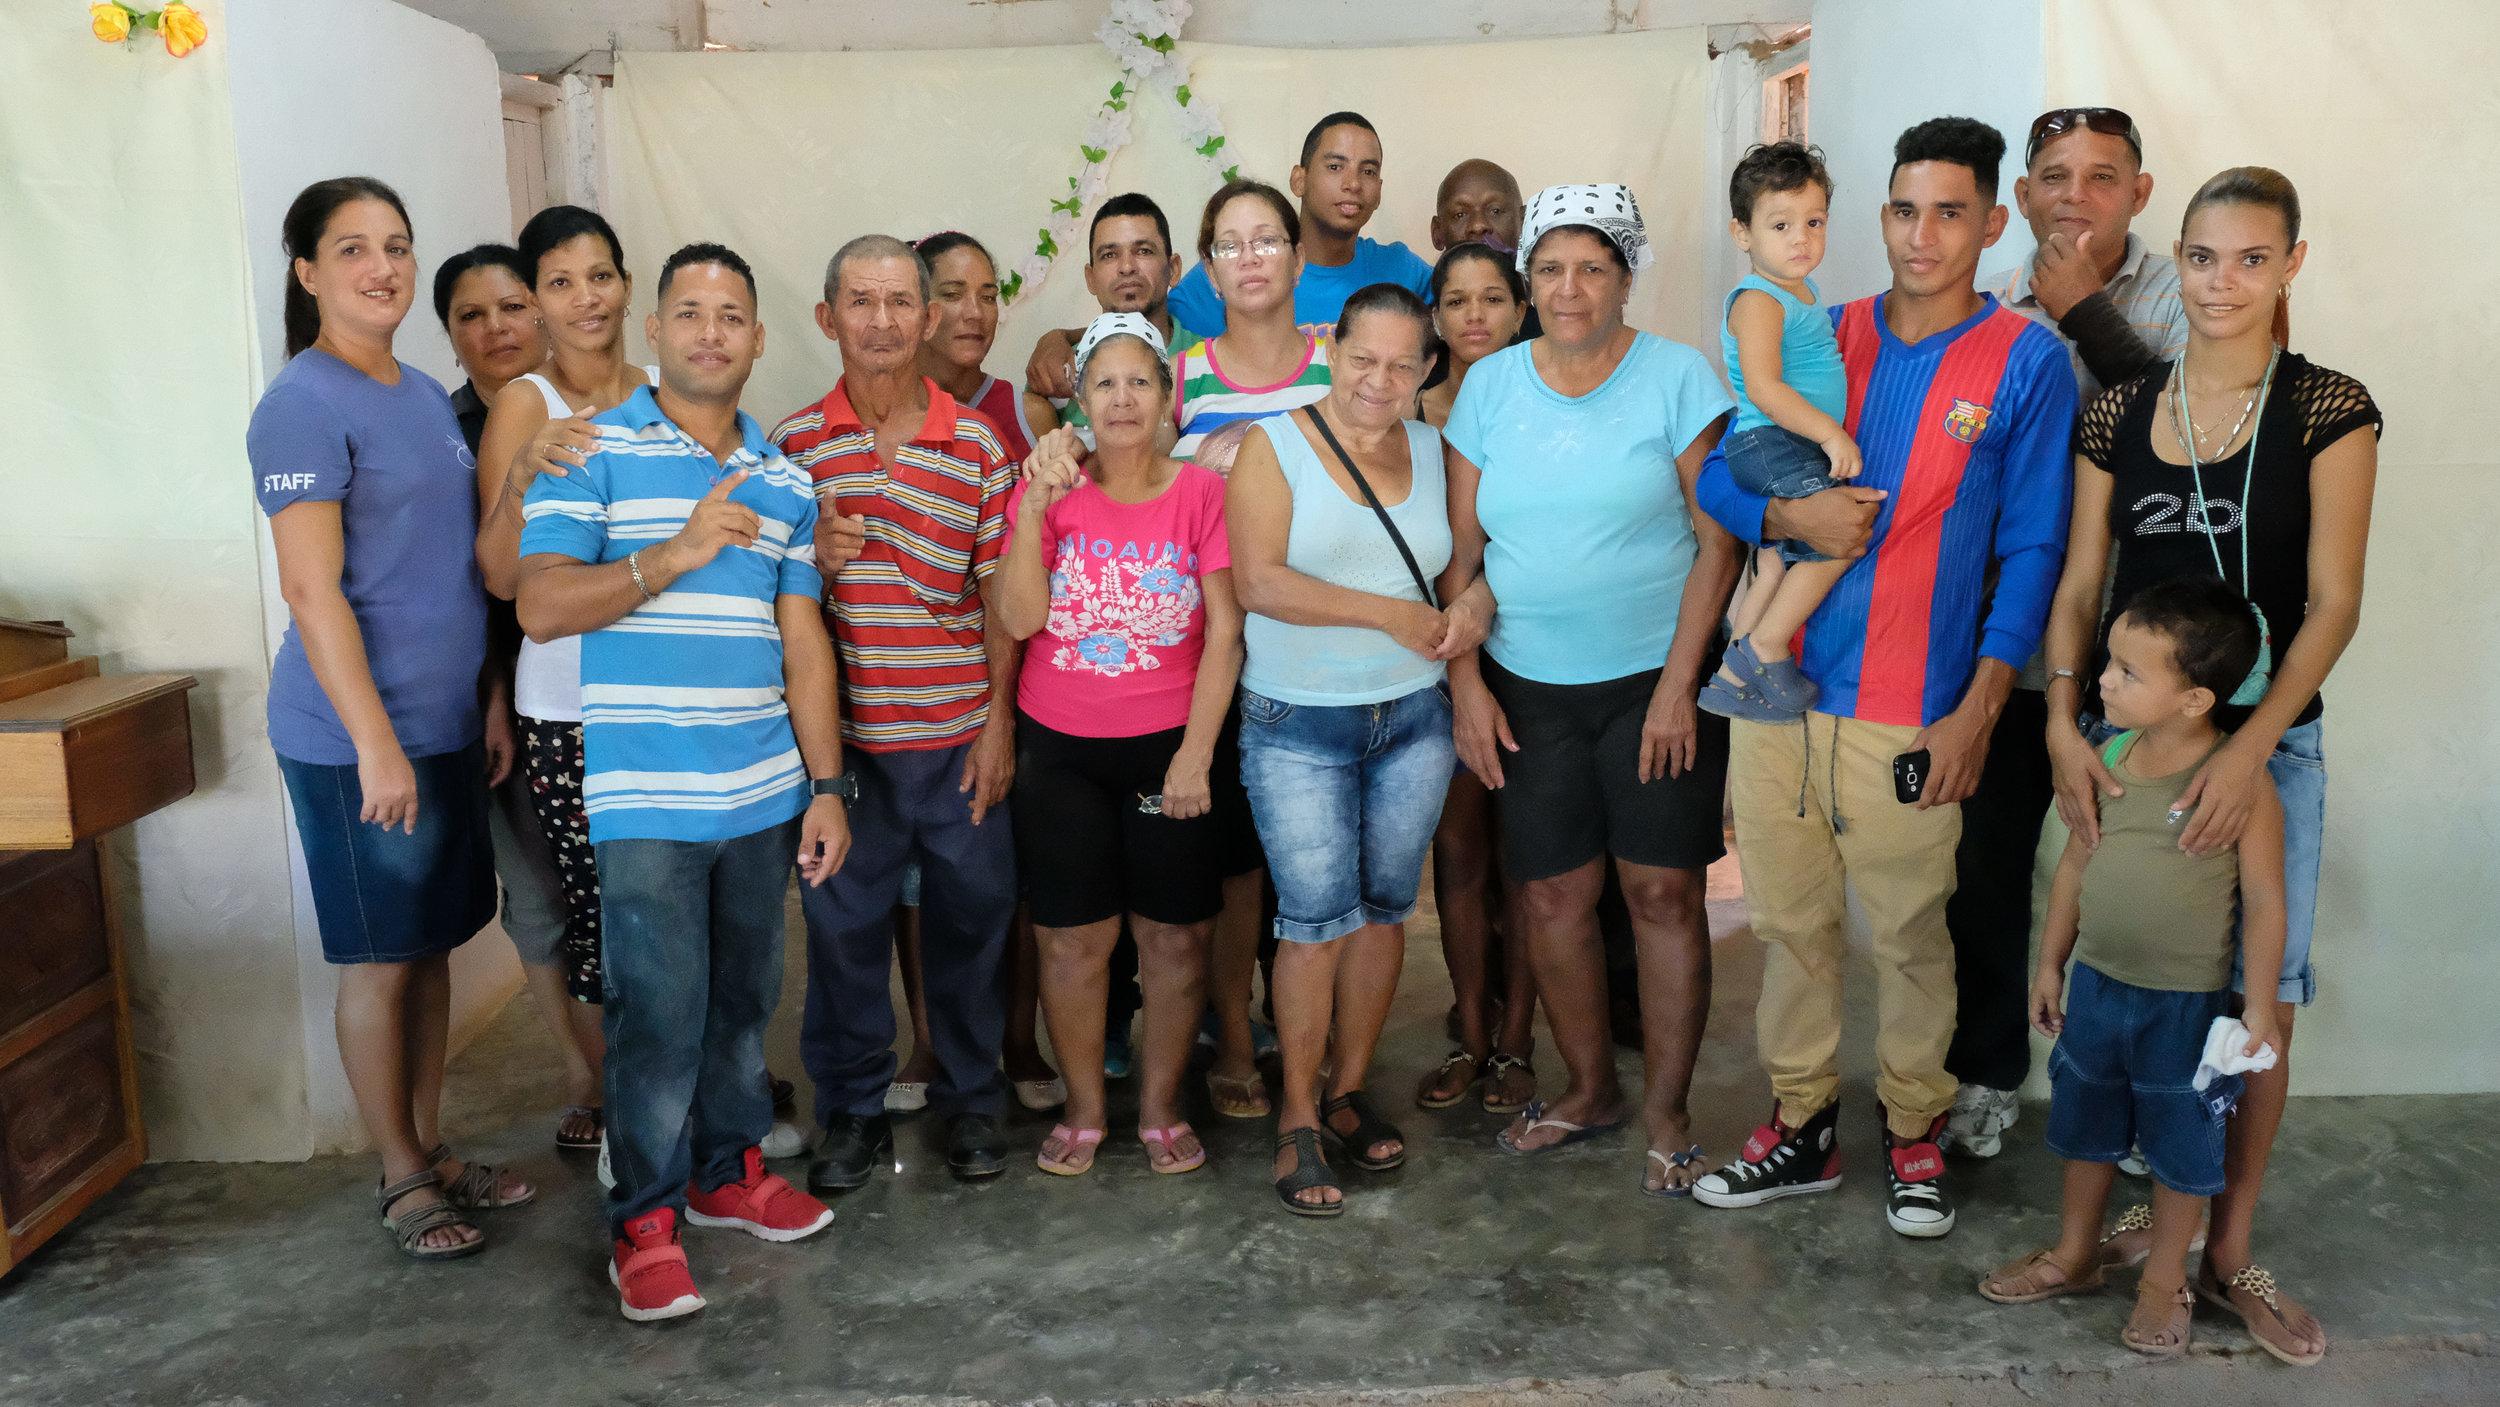 Ocujal Retreat- Guantánamo & Ocujal de Yateria Deaf Christians